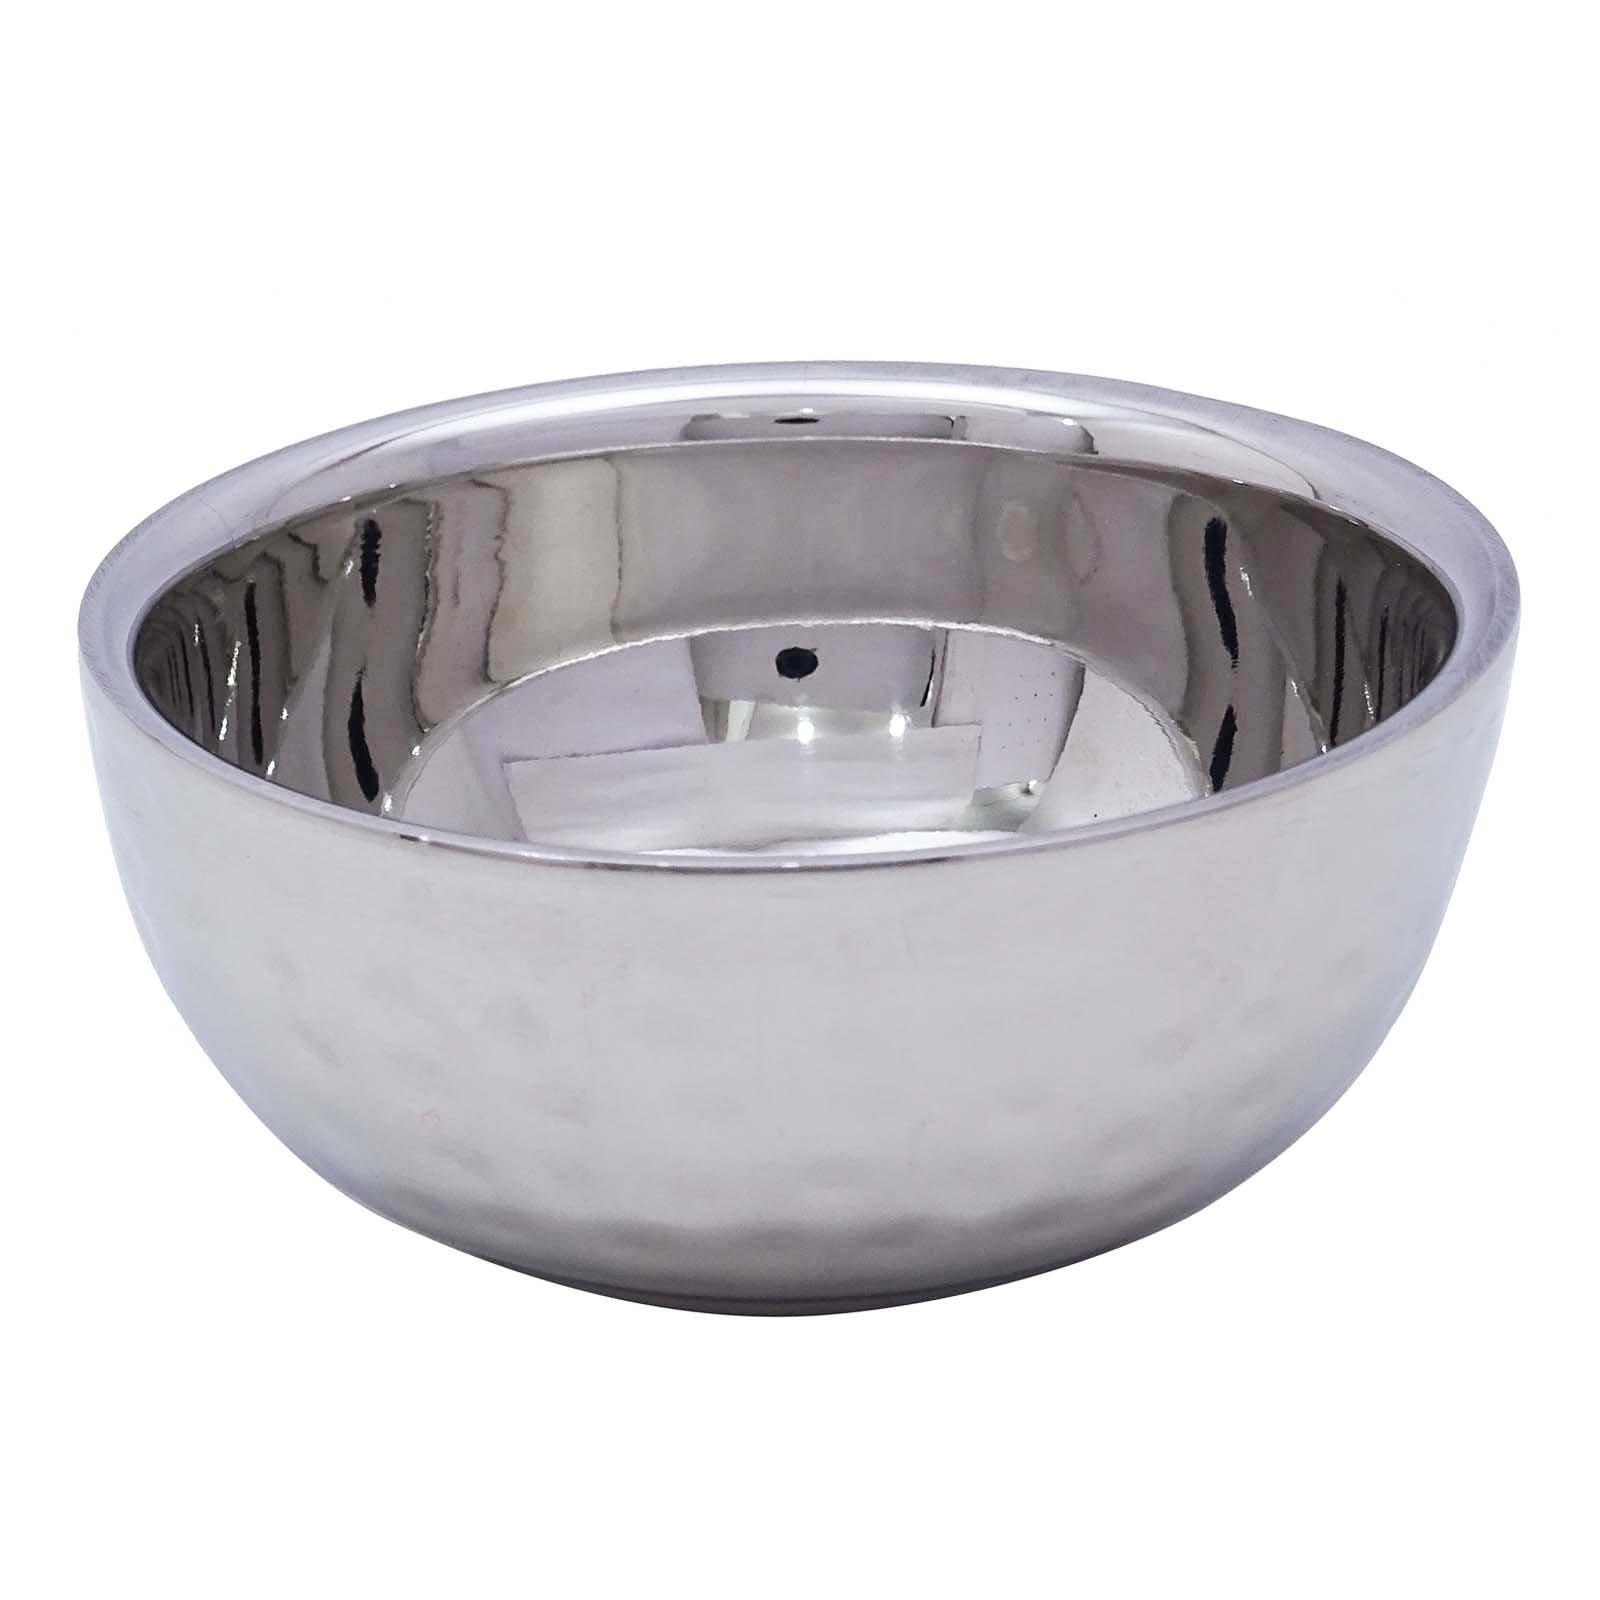 Indian Stainless Steel Hammered Katori Chutni Bowl Serveware Kitchenware Utensil